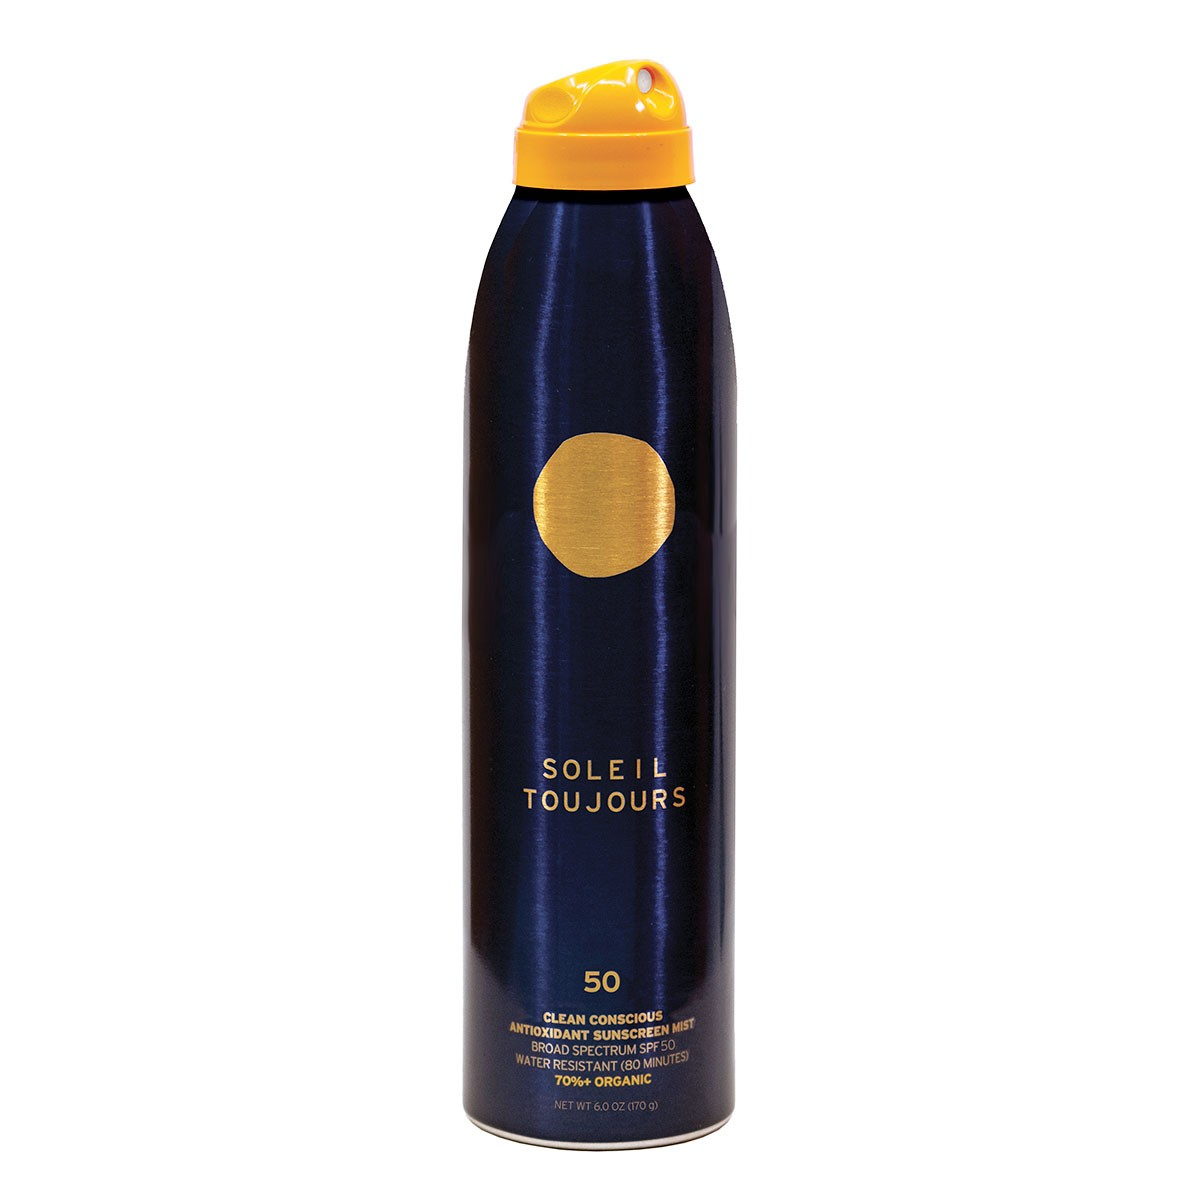 Soleil Toujours SPF 50 Clean Conscious Antioxidant Sunscreen Mist - crema solar natural